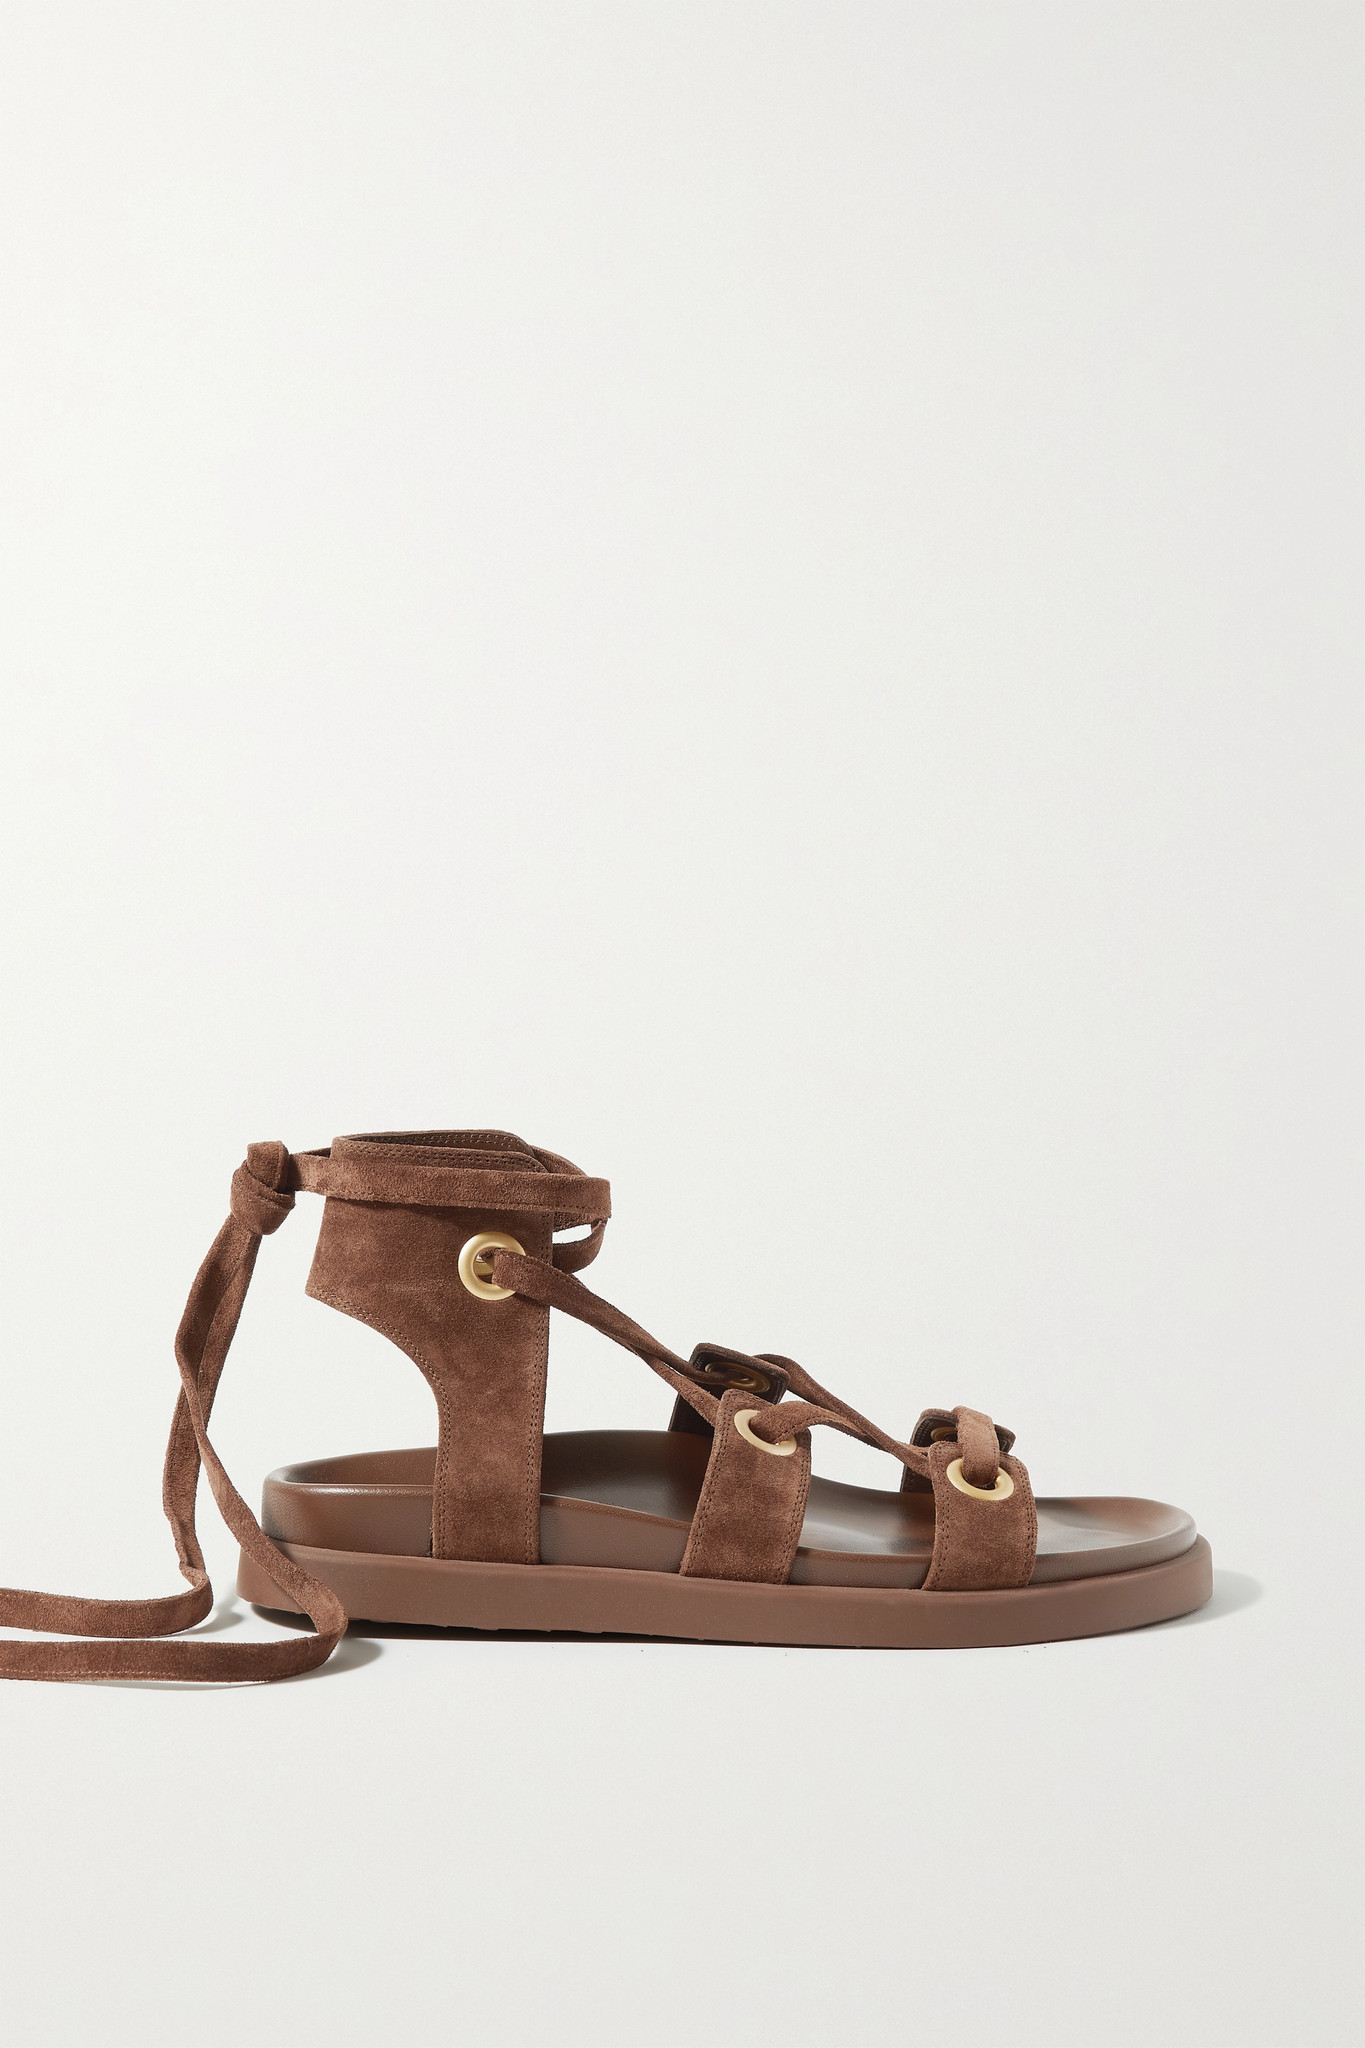 GIANVITO ROSSI - Ibiza 绒面革凉鞋 - 棕色 - IT38.5